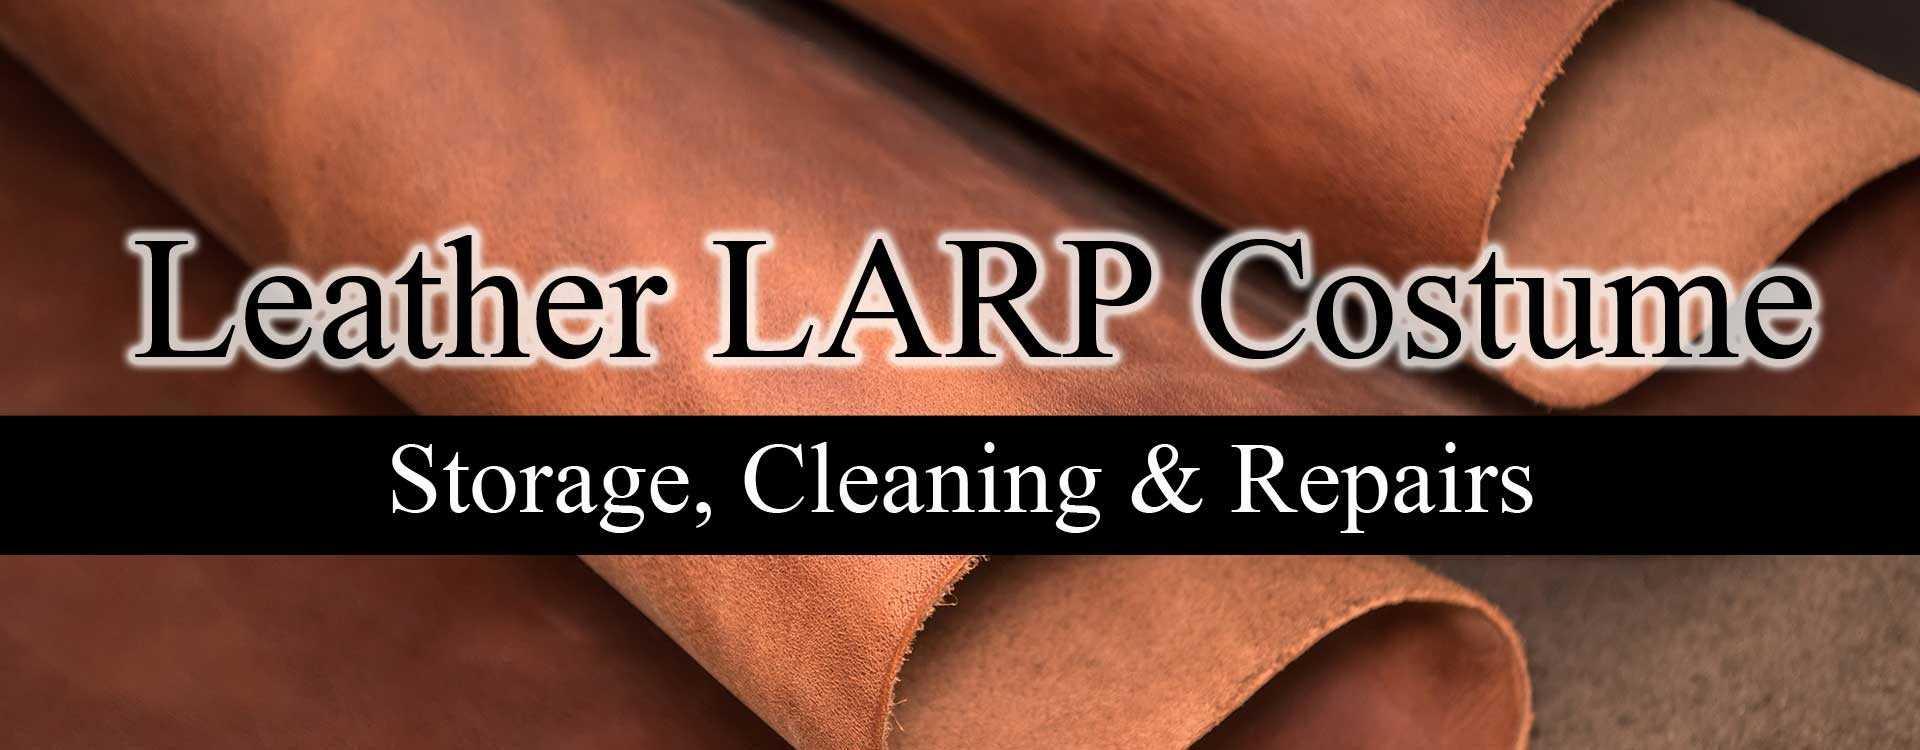 Leather LARP Costume Maintenance, Storage & Repairs